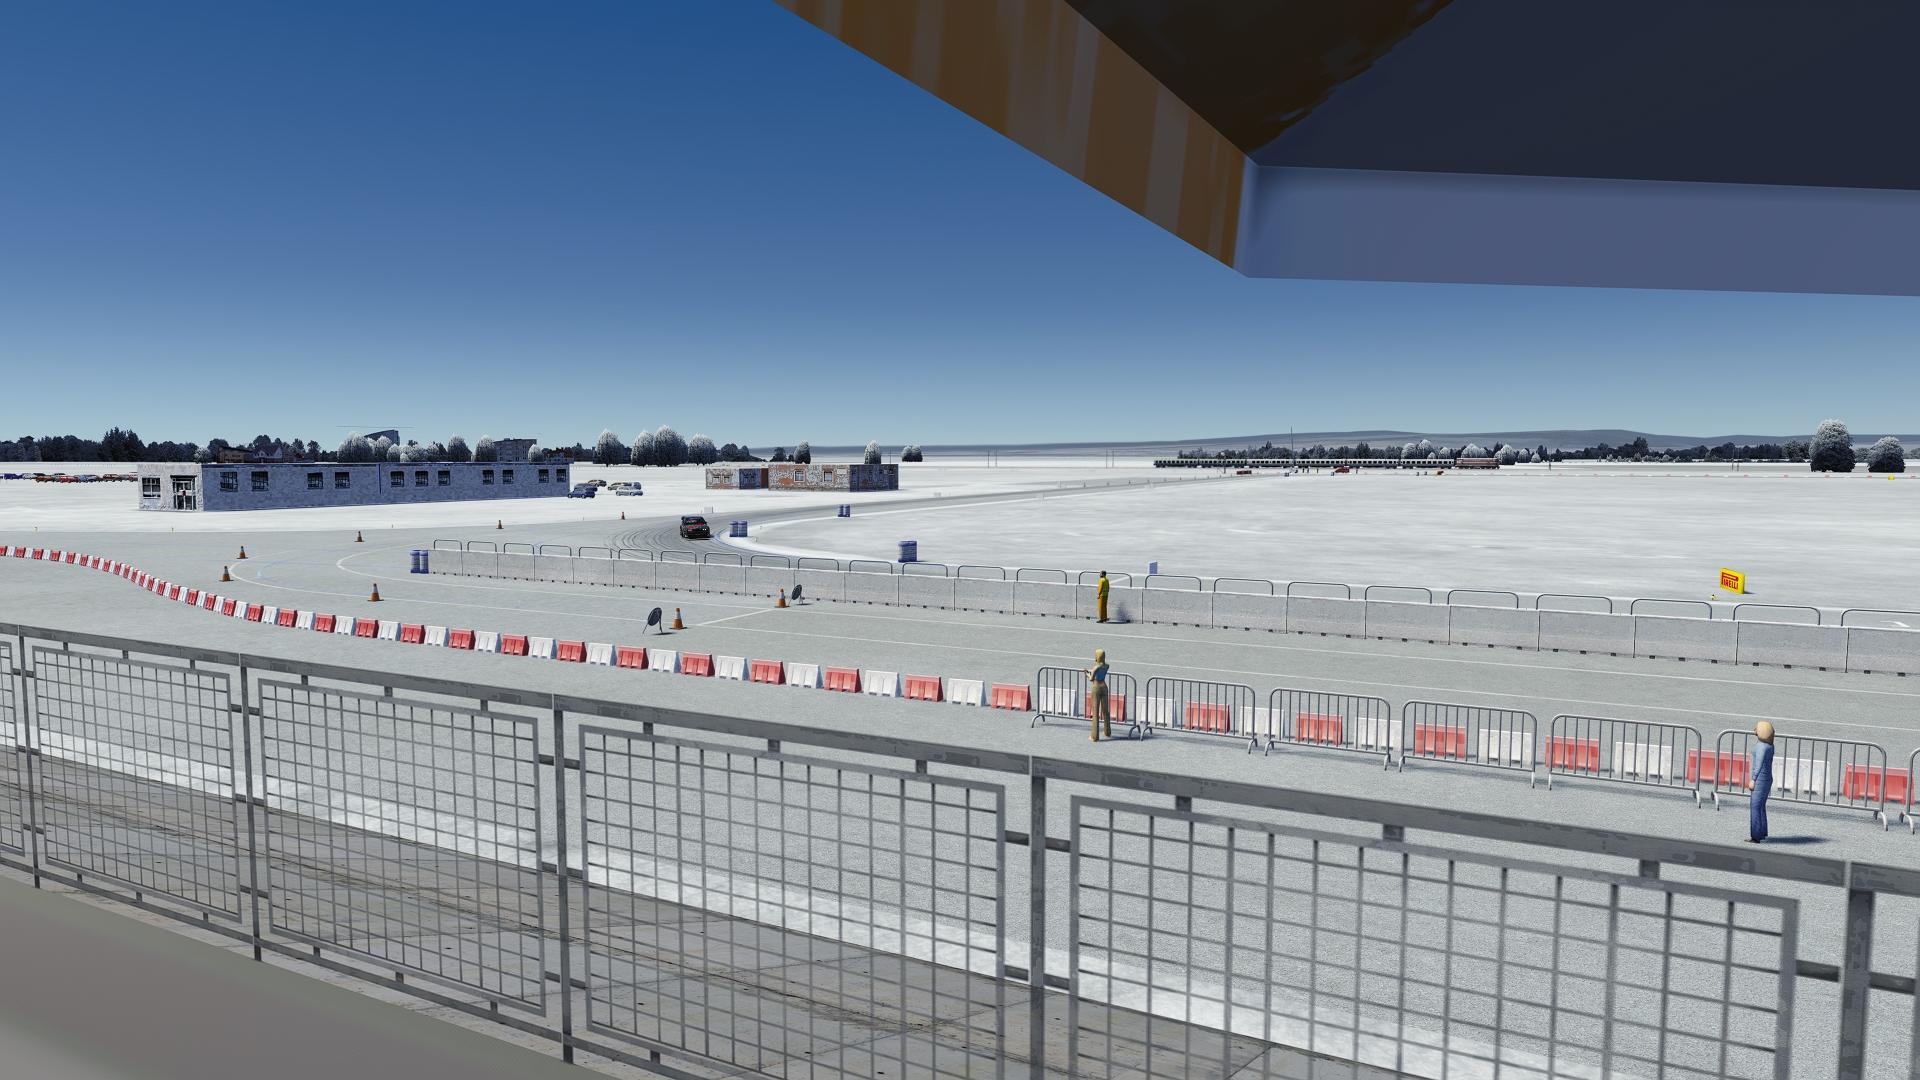 Screenshot_zs_calibra_dtm_airport_piestany_29-4-121-18-13-35.jpg